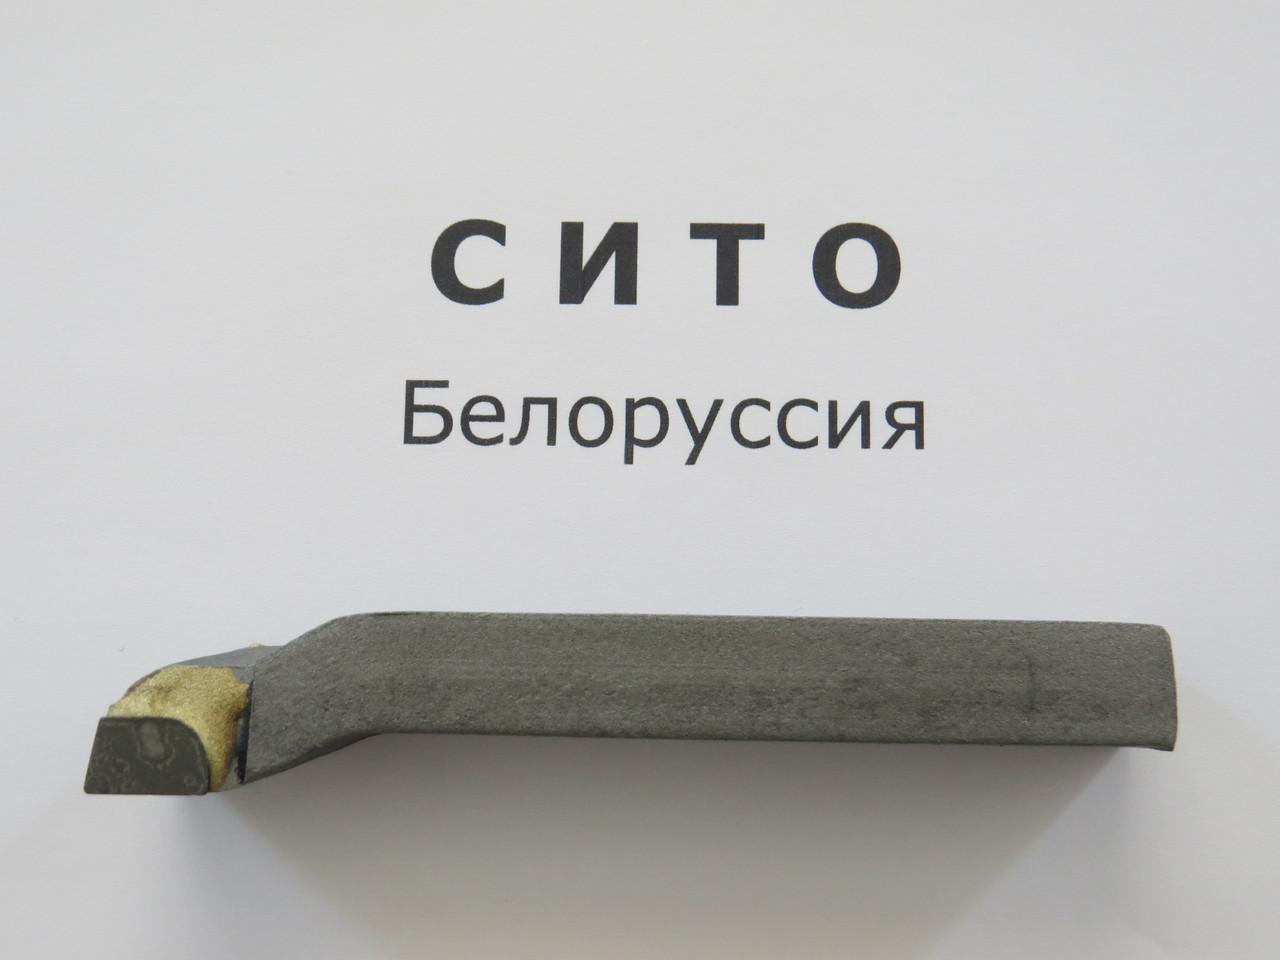 Резец проходной упорно изогнутый 40х25х200 (Т15К6) СИТО Беларусь